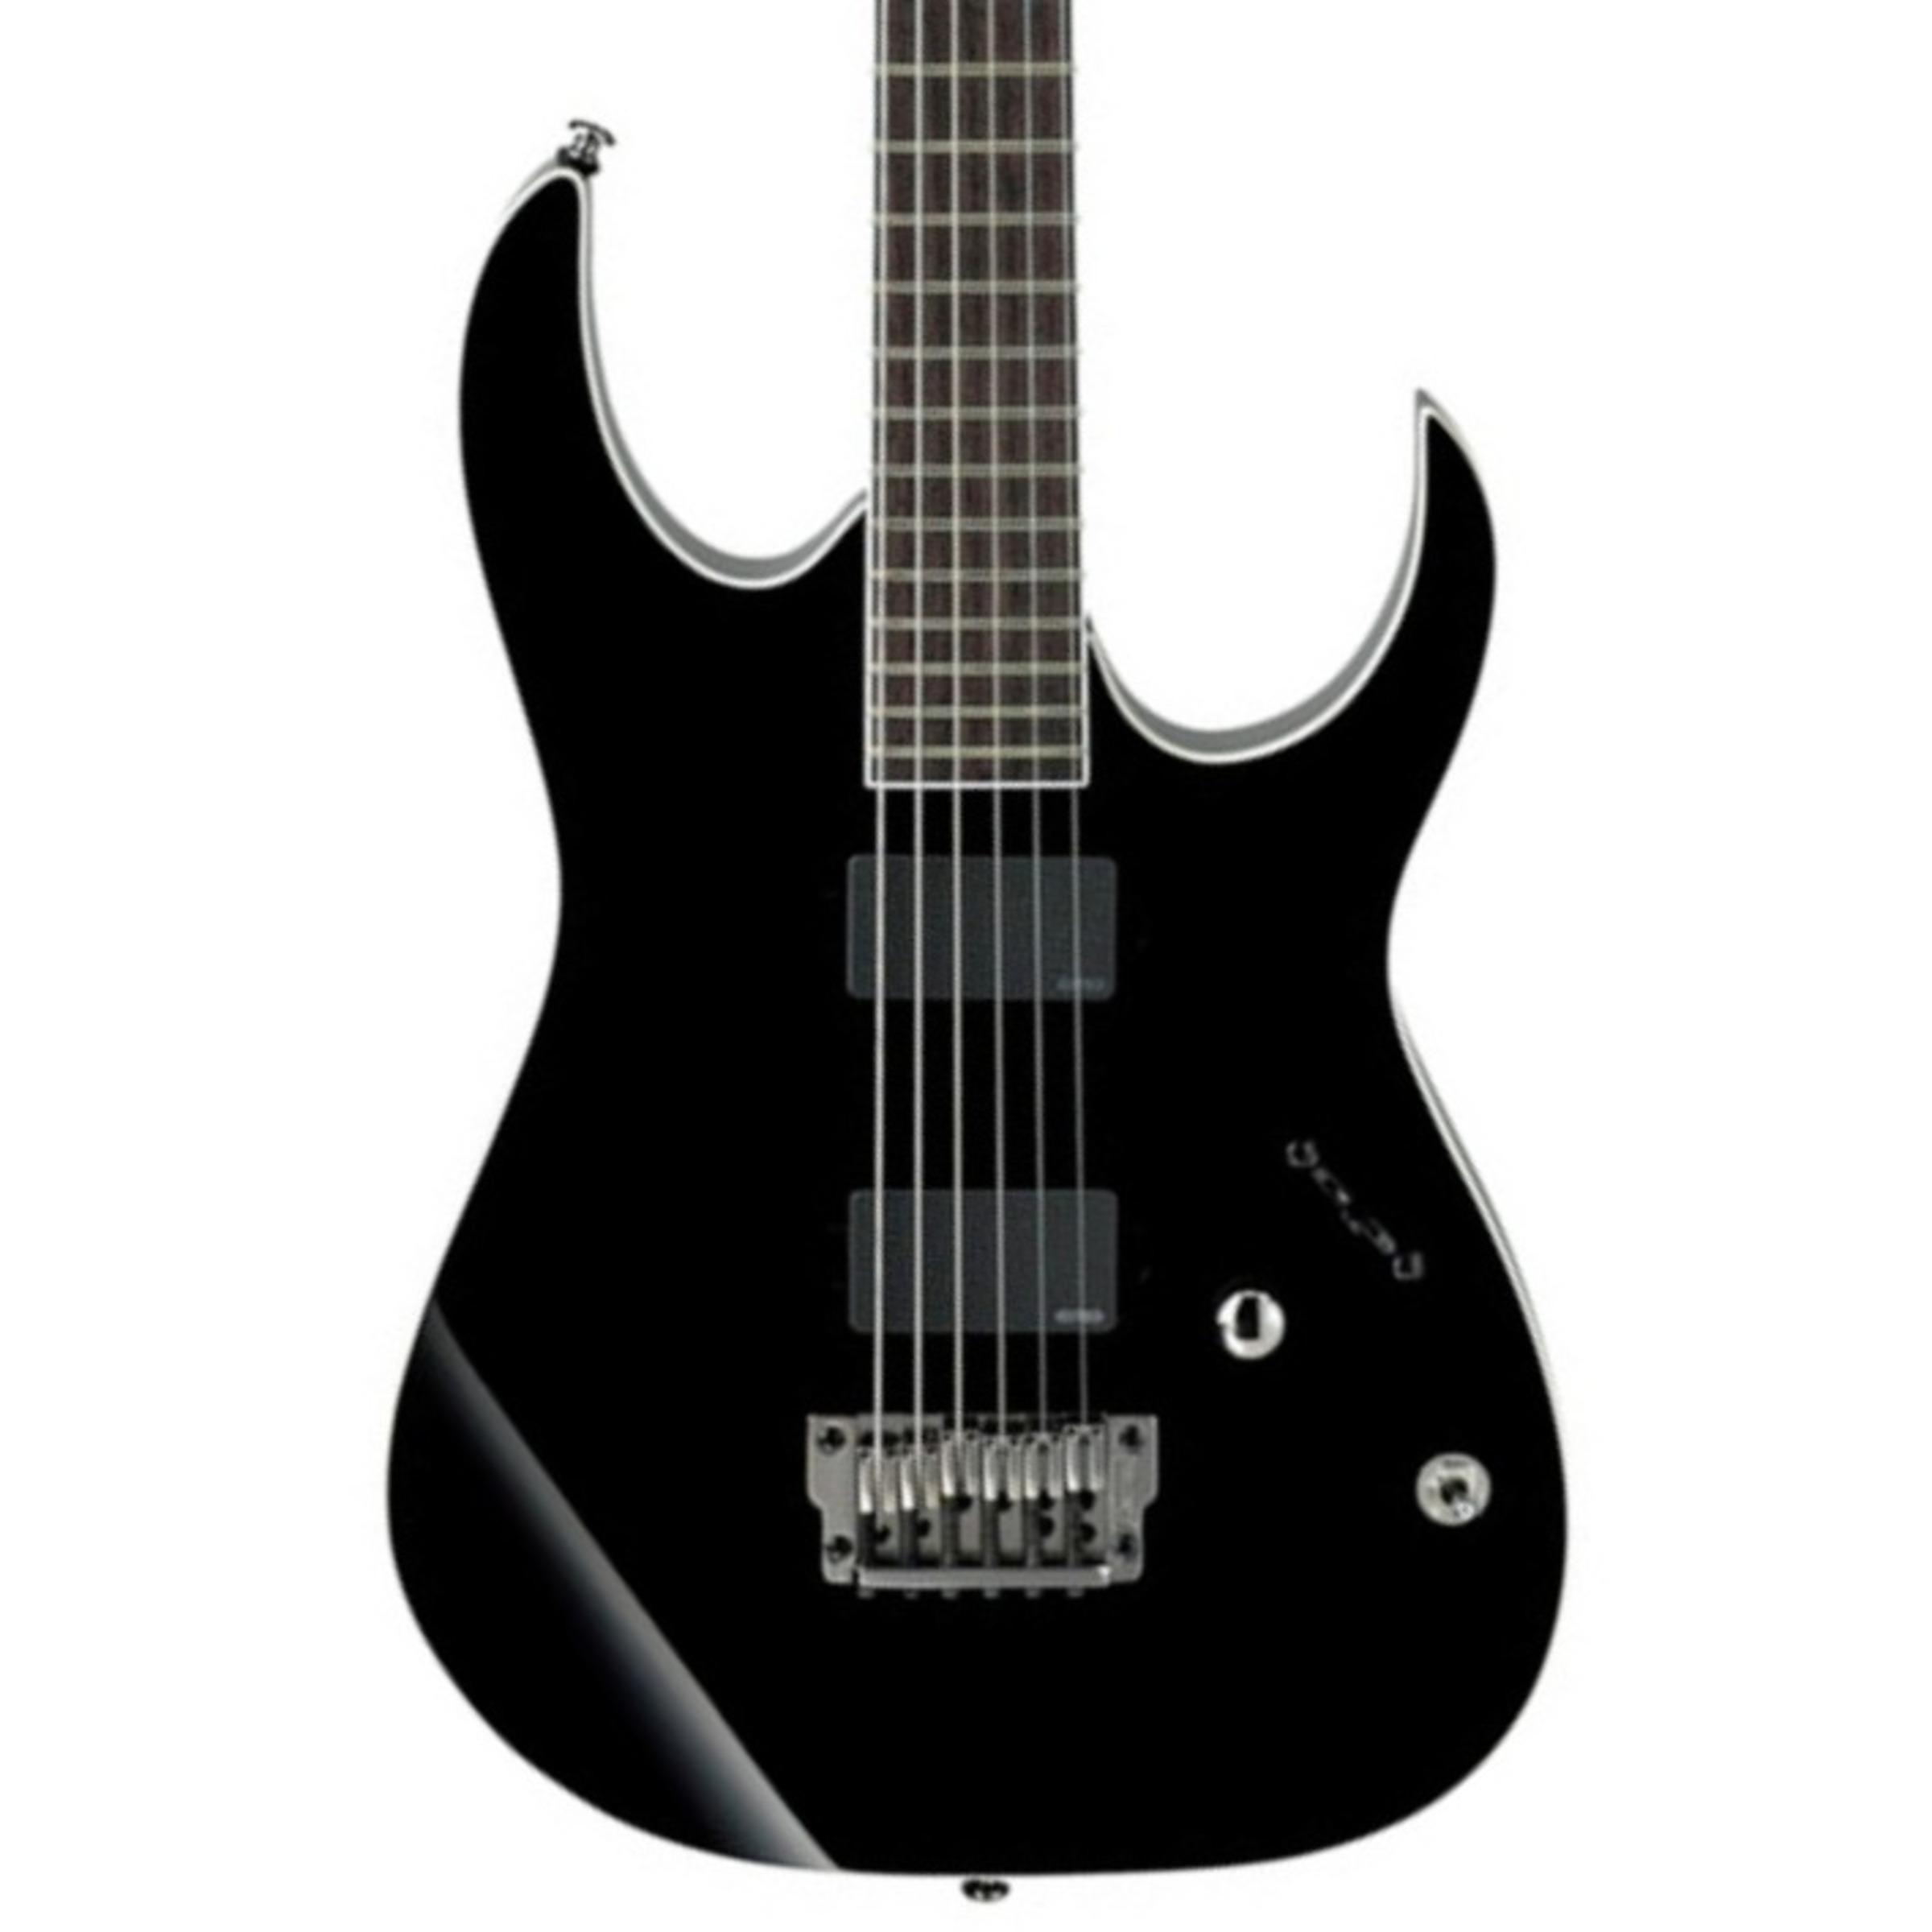 ibanez rgib6 iron label baritone electric guitar black giggear. Black Bedroom Furniture Sets. Home Design Ideas